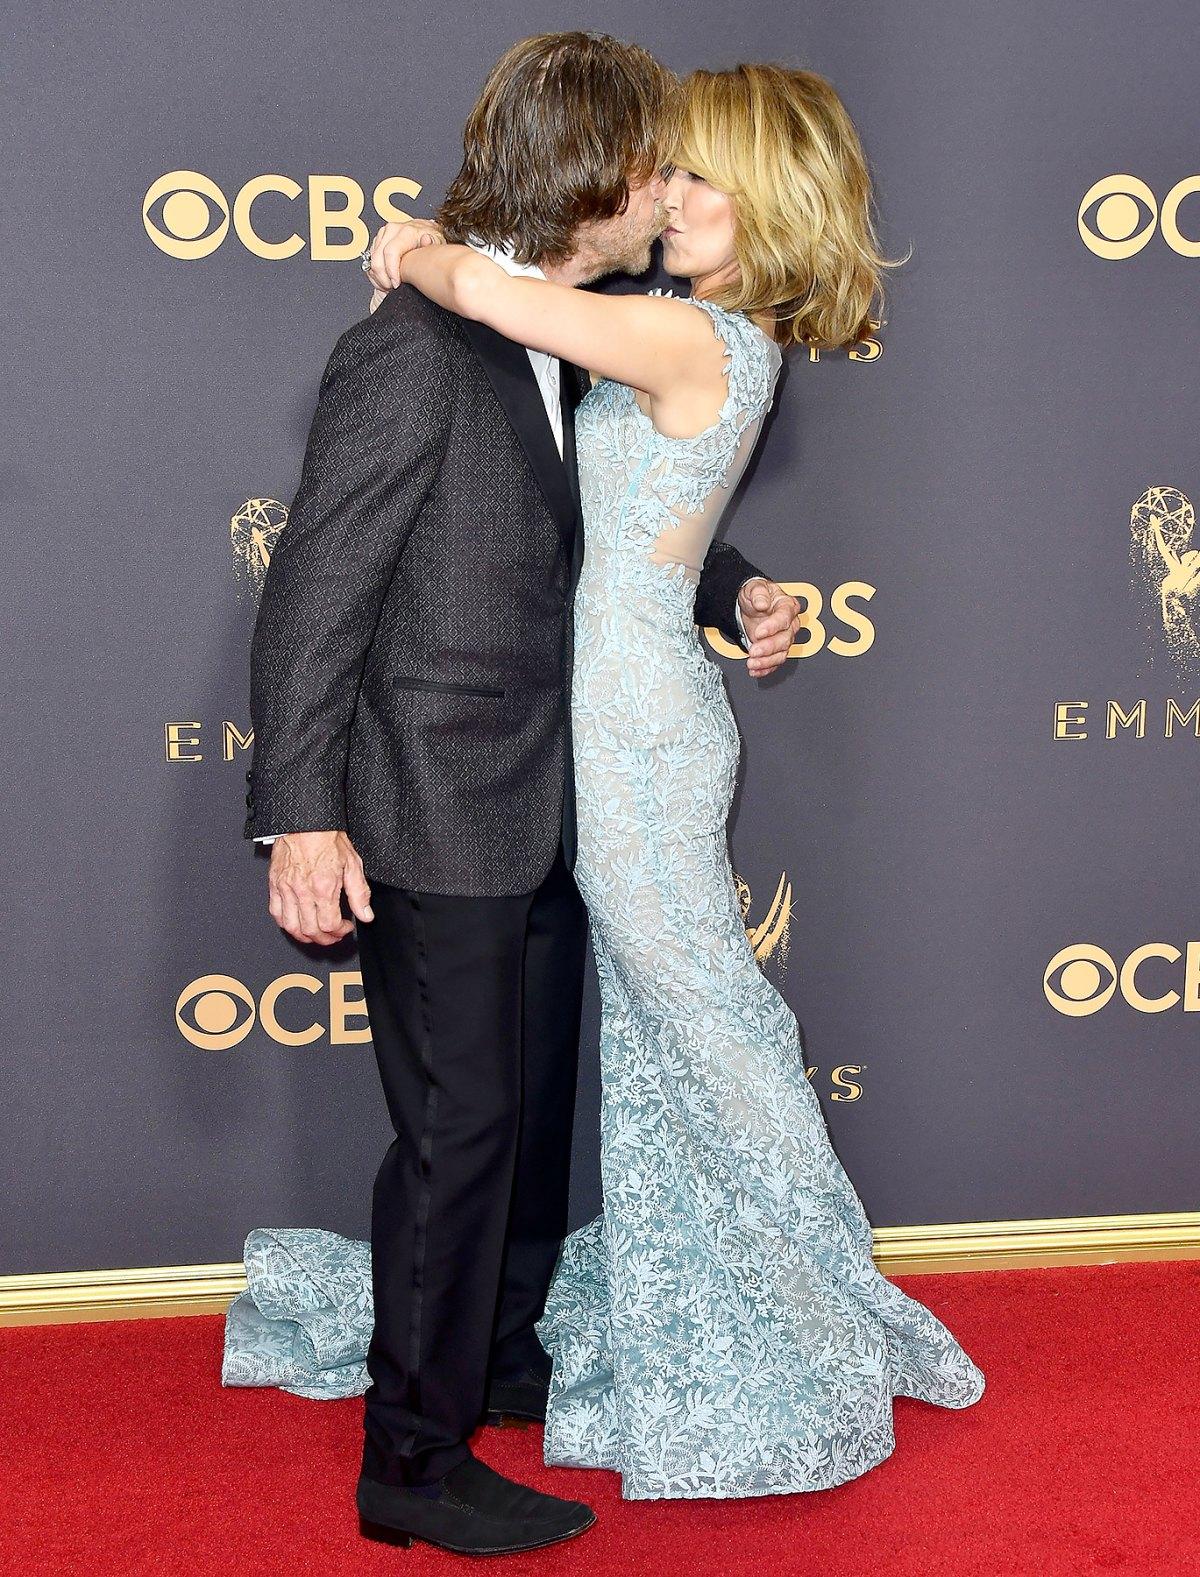 Emmy Awards Pda Stars Get Kissy On The Red Carpet Us Weekly A série stateless com yvonne strahovski no elenco chega no catálogo.da netflix dia 8 de julho. emmy awards pda stars get kissy on the